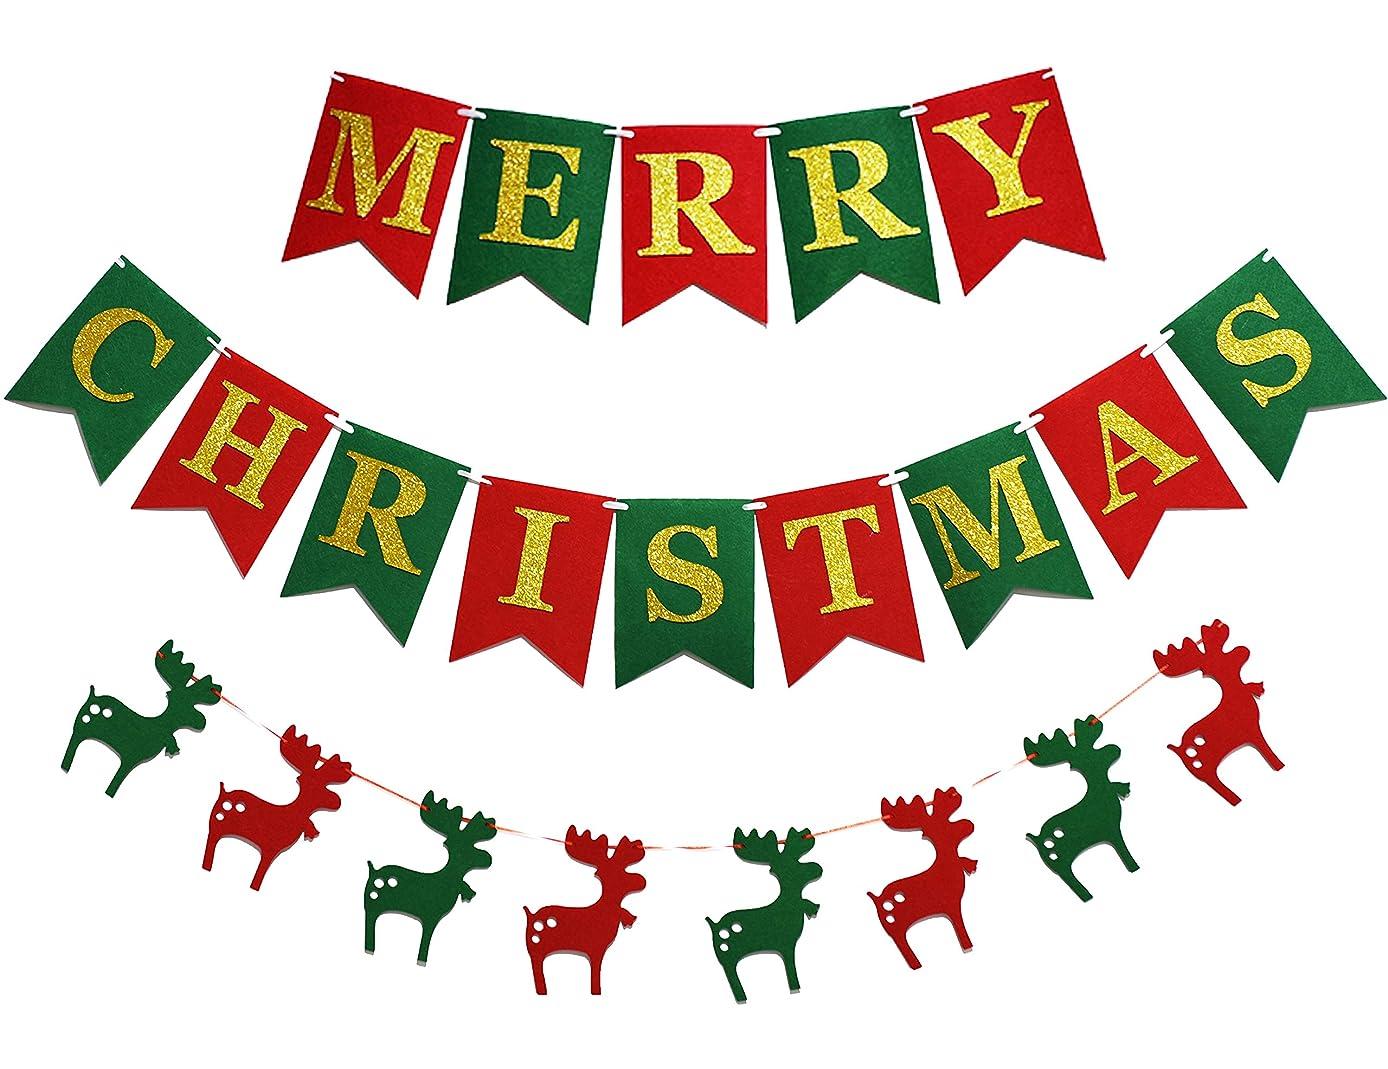 THAWAY Felt Fabric Merry Christmas Banners, Christmas Wall Decorations, Christmas Reindeer Pennent Banner, Christmas Fireplace Wall Banner